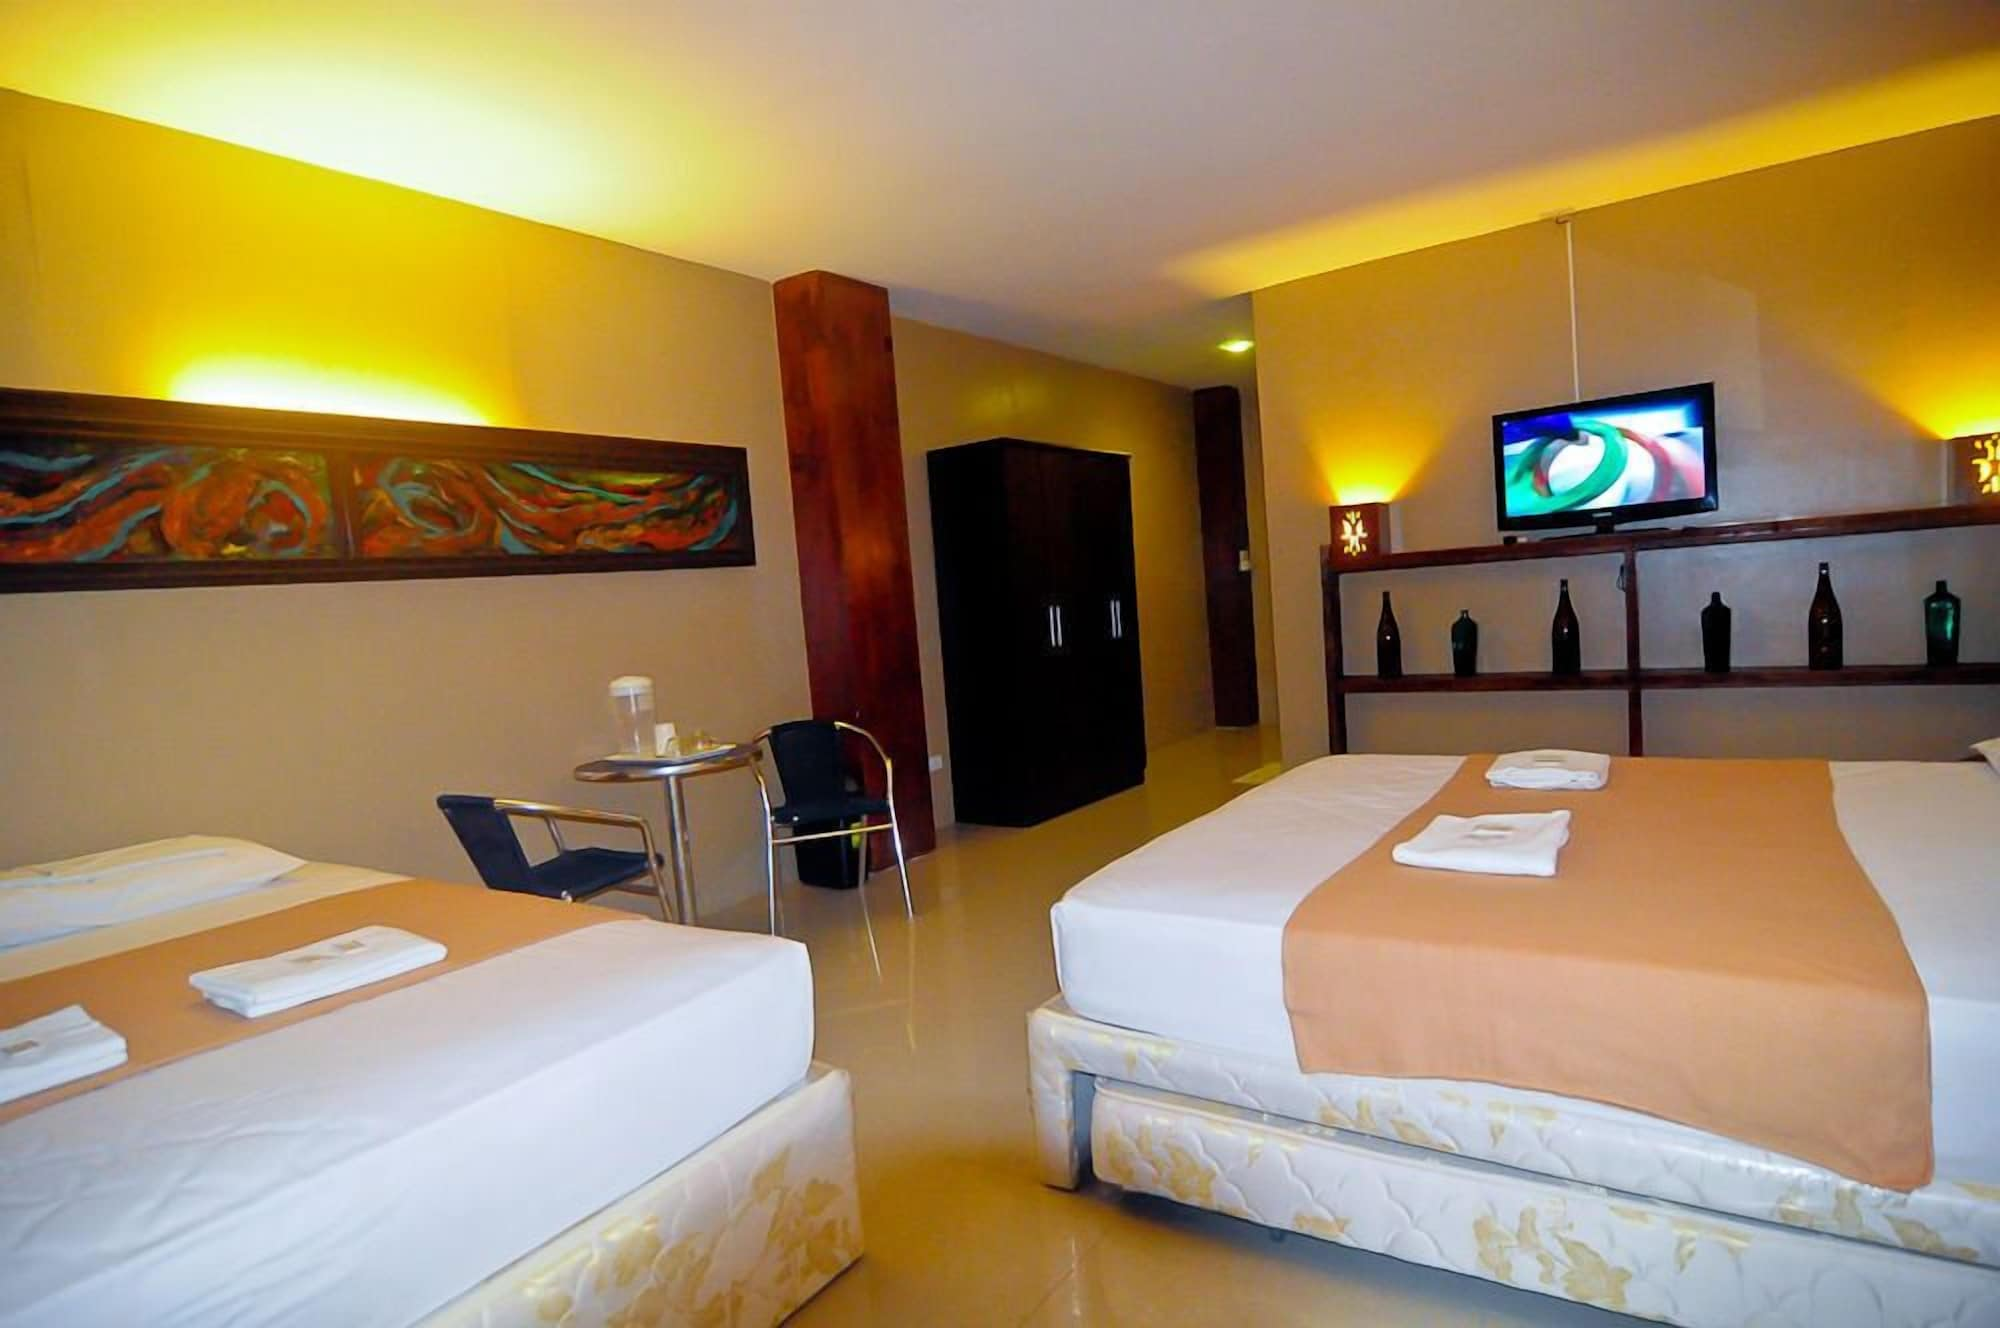 Royal Coast Tourist Inn and Restaurant, Tagbilaran City